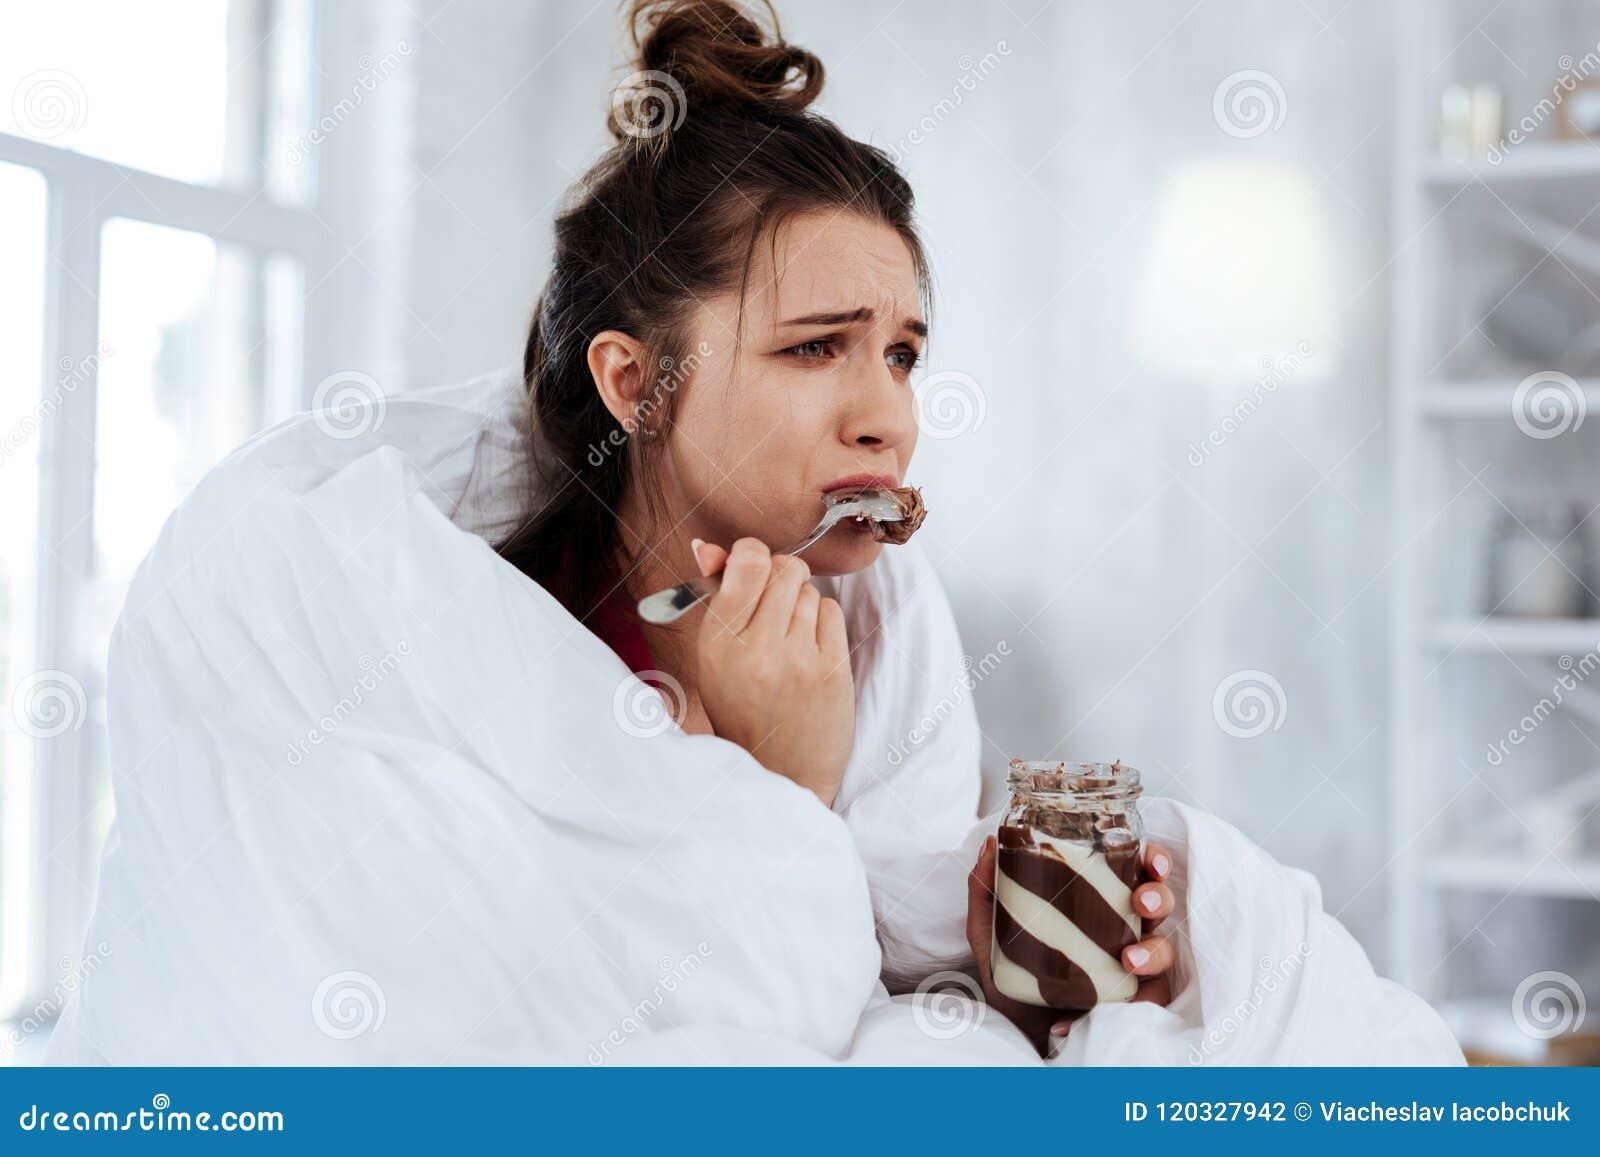 Woman feeling emotional while watching melodrama